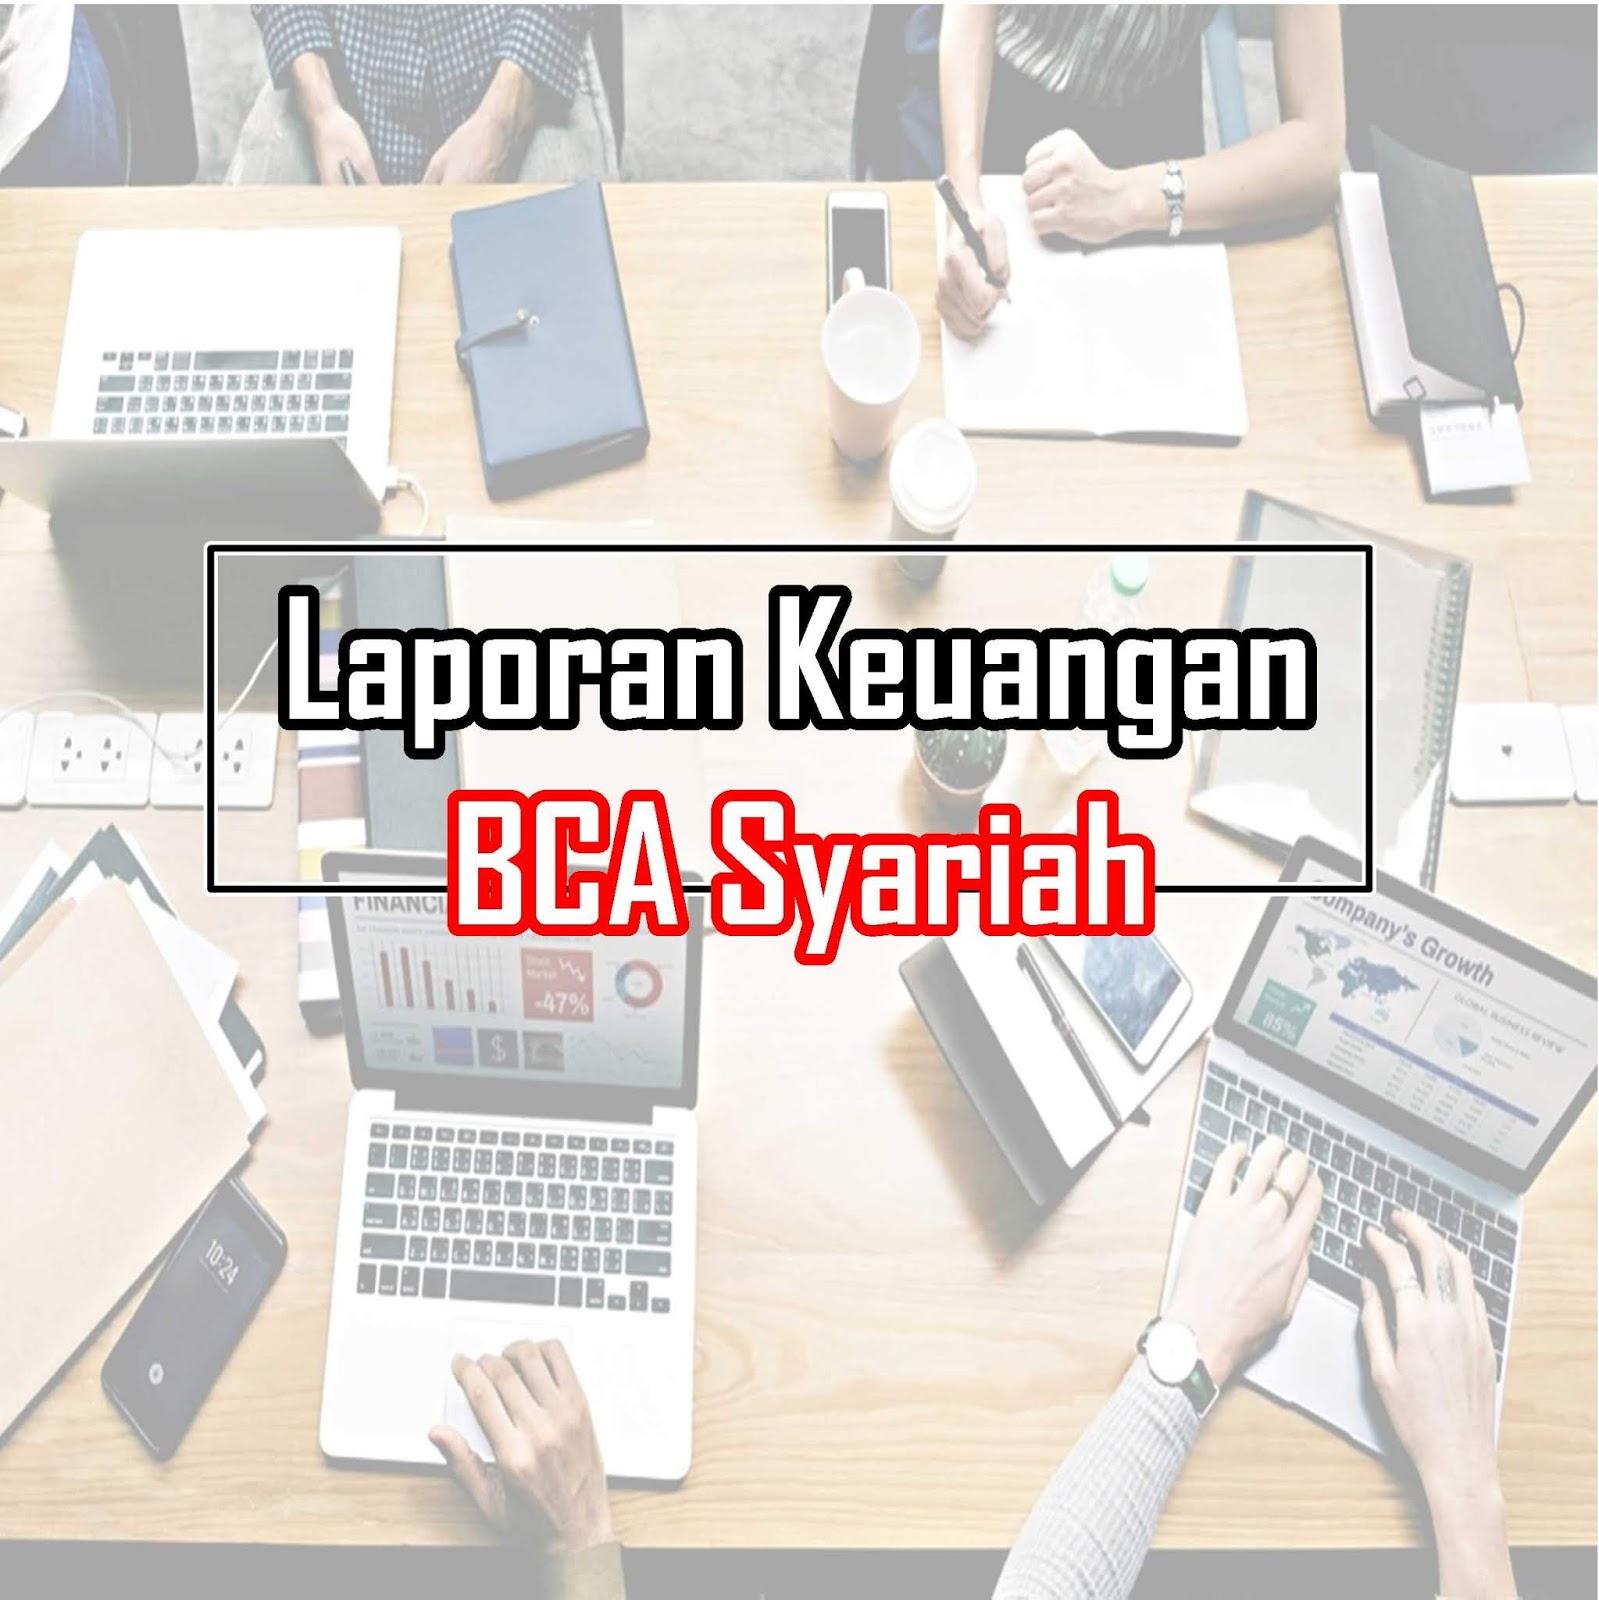 Download Laporan Keuangan Tahunan Bca Syariah Rasio Keuangan Edusaham